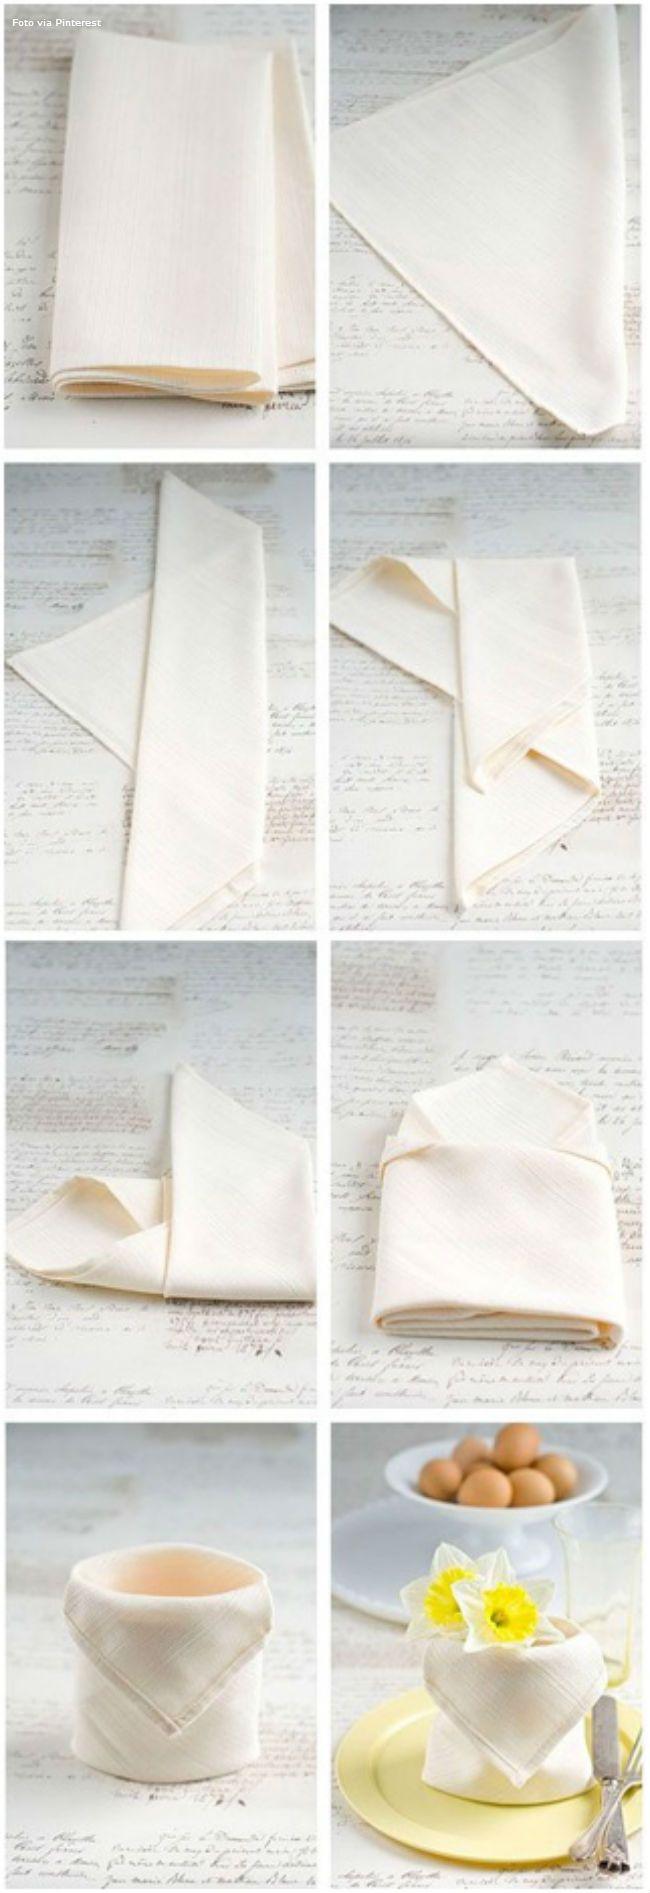 Napkin Fold - 35 Beautiful Ex&les of Napkin Folding  sc 1 st  Pinterest & 12 Passo a passo | napkins | Pinterest | Napkins Origami and ...